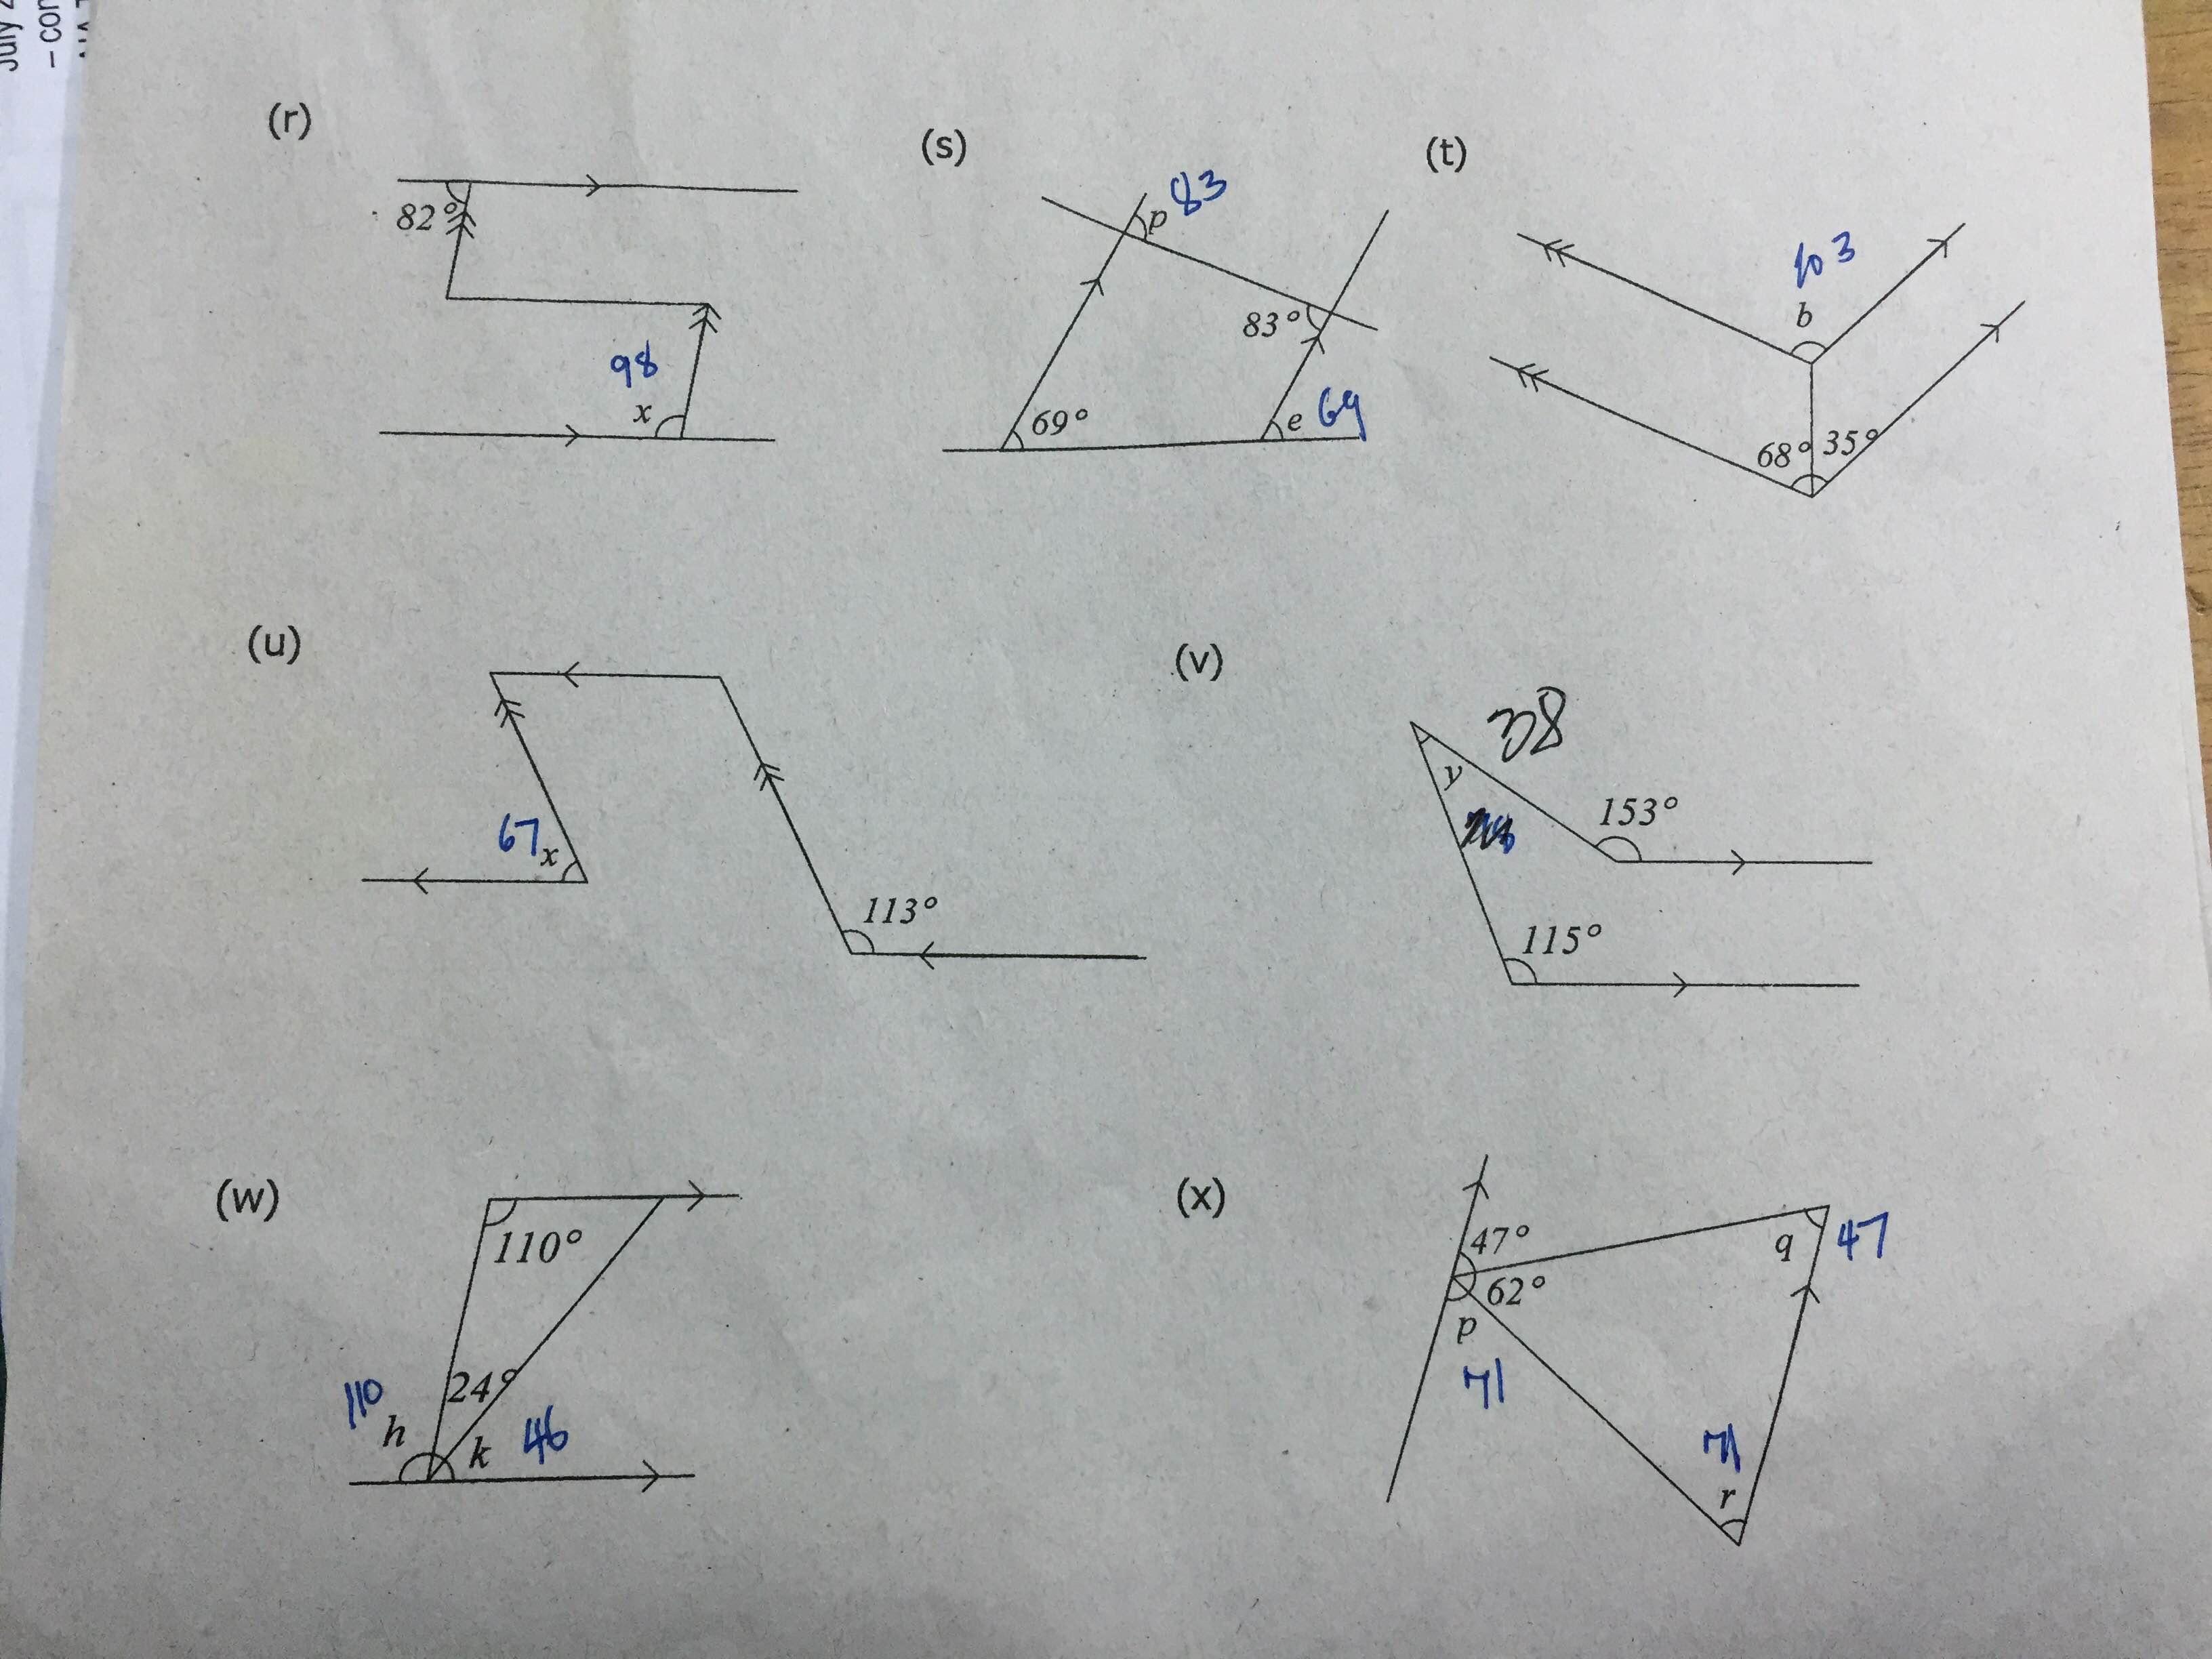 Grade 11 Regular Ateneo High School Mathematics